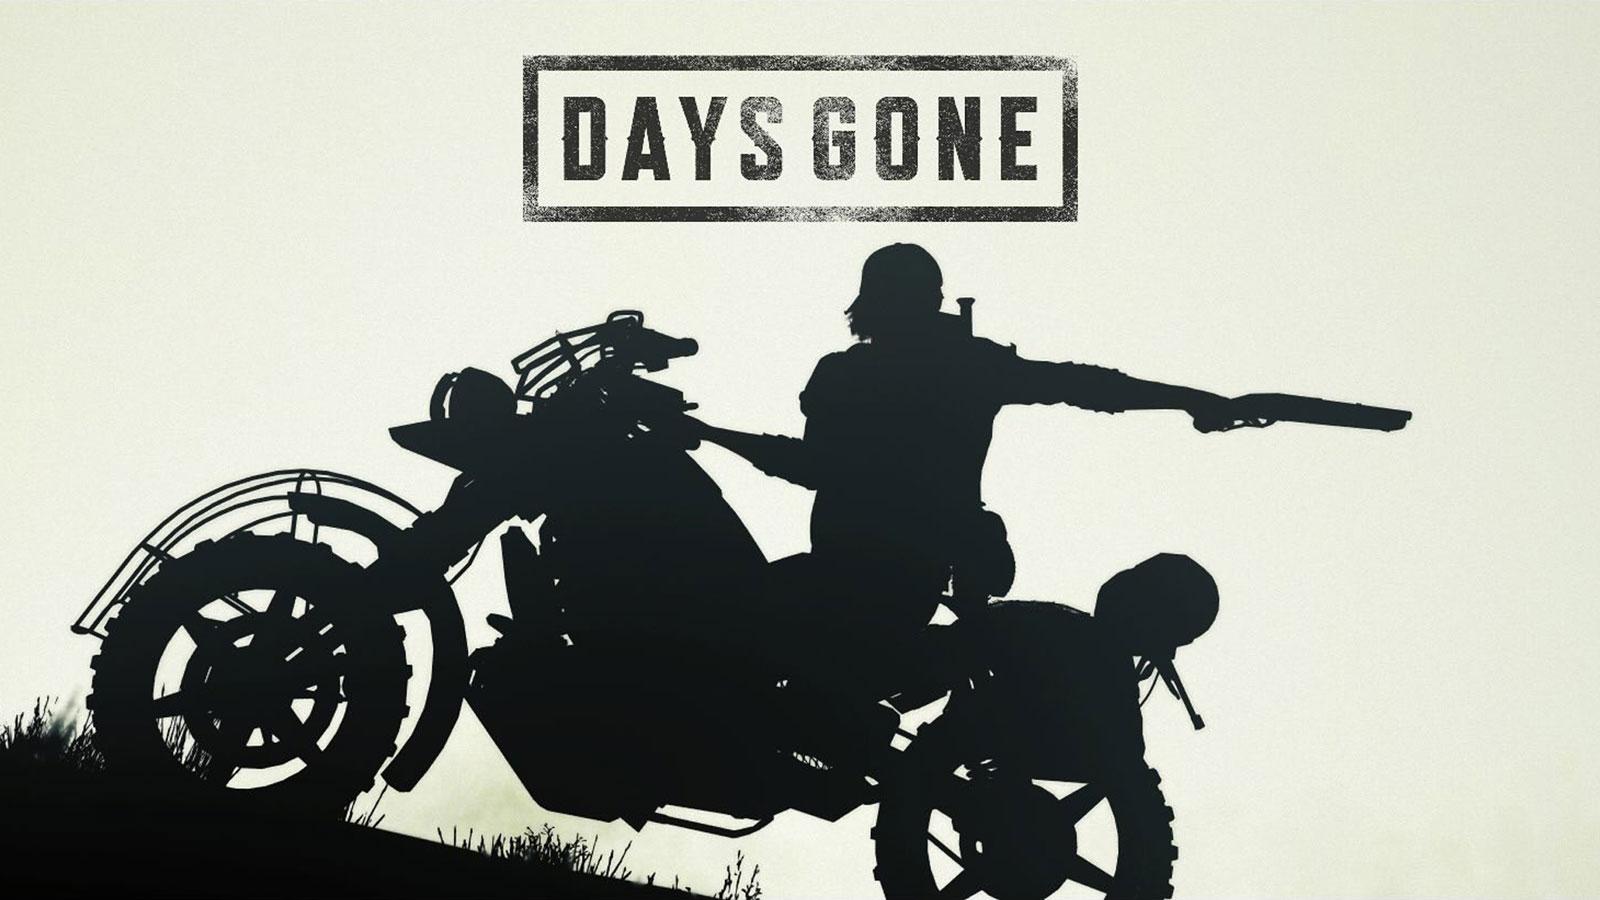 Free Days Gone Wallpaper in 1600x900